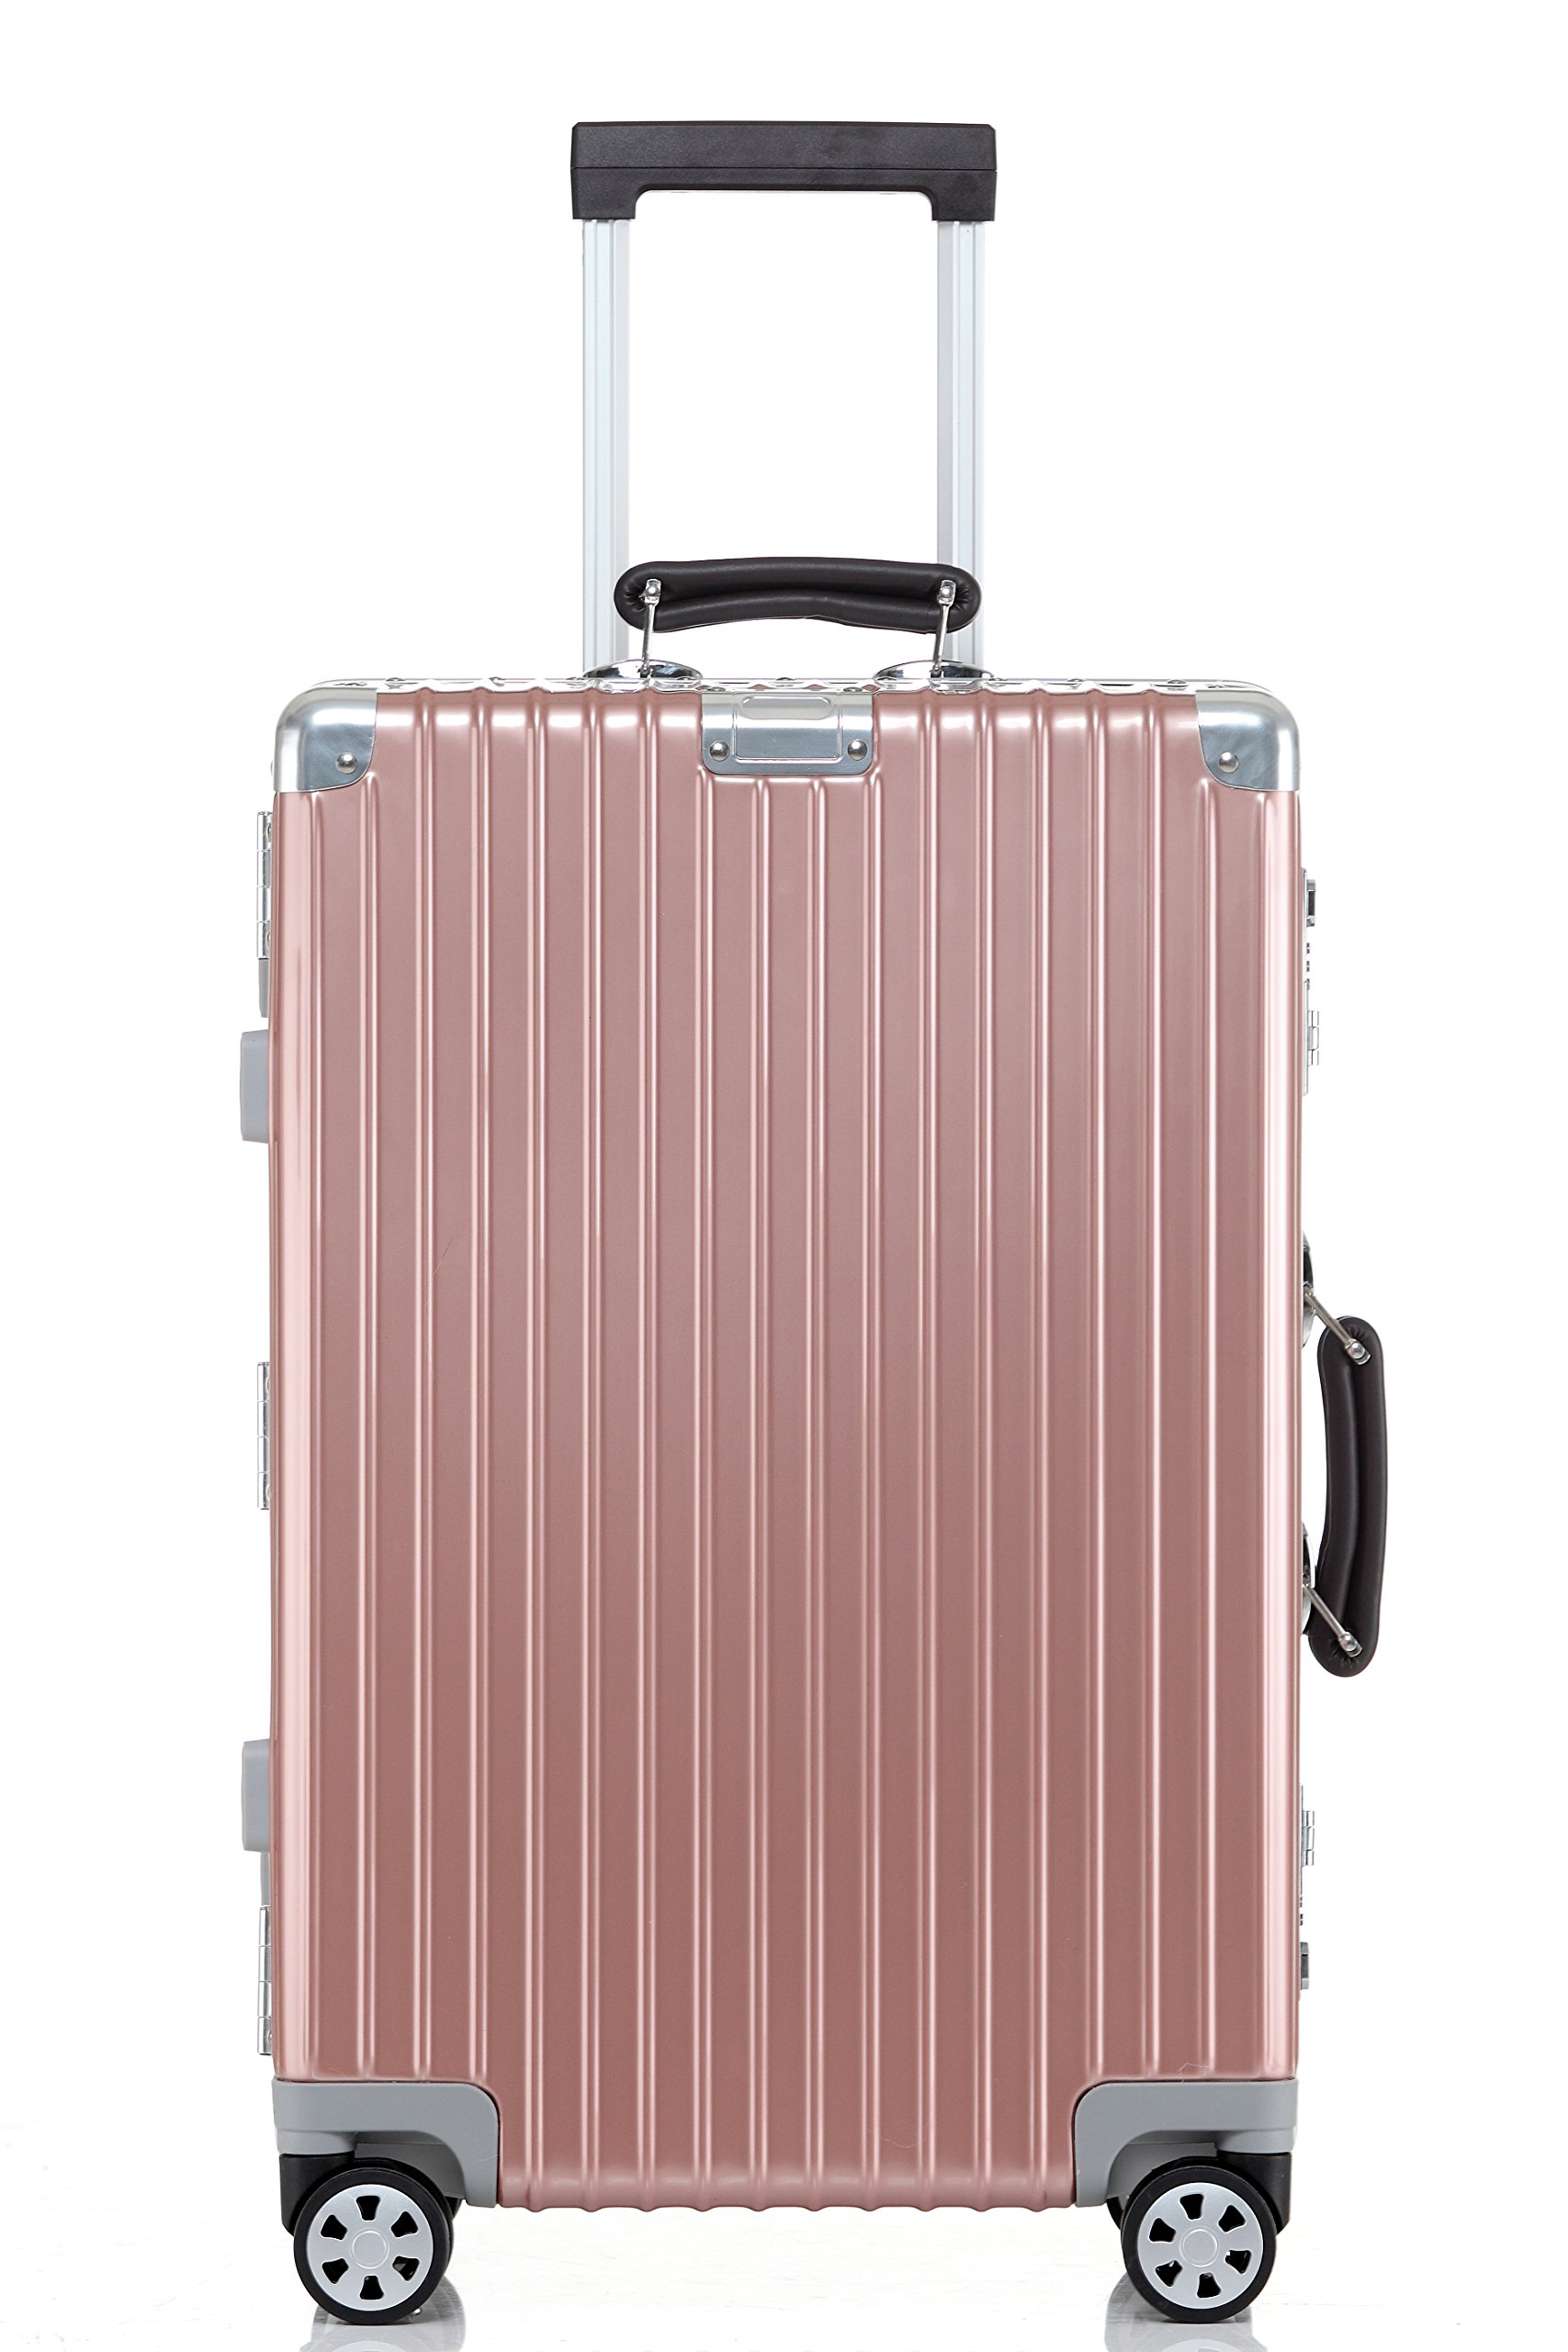 Checked Luggage, Clothink Aluminum Frame Hardside Suitcase Modern Travel Spinner 28 Inch, Rose Gold